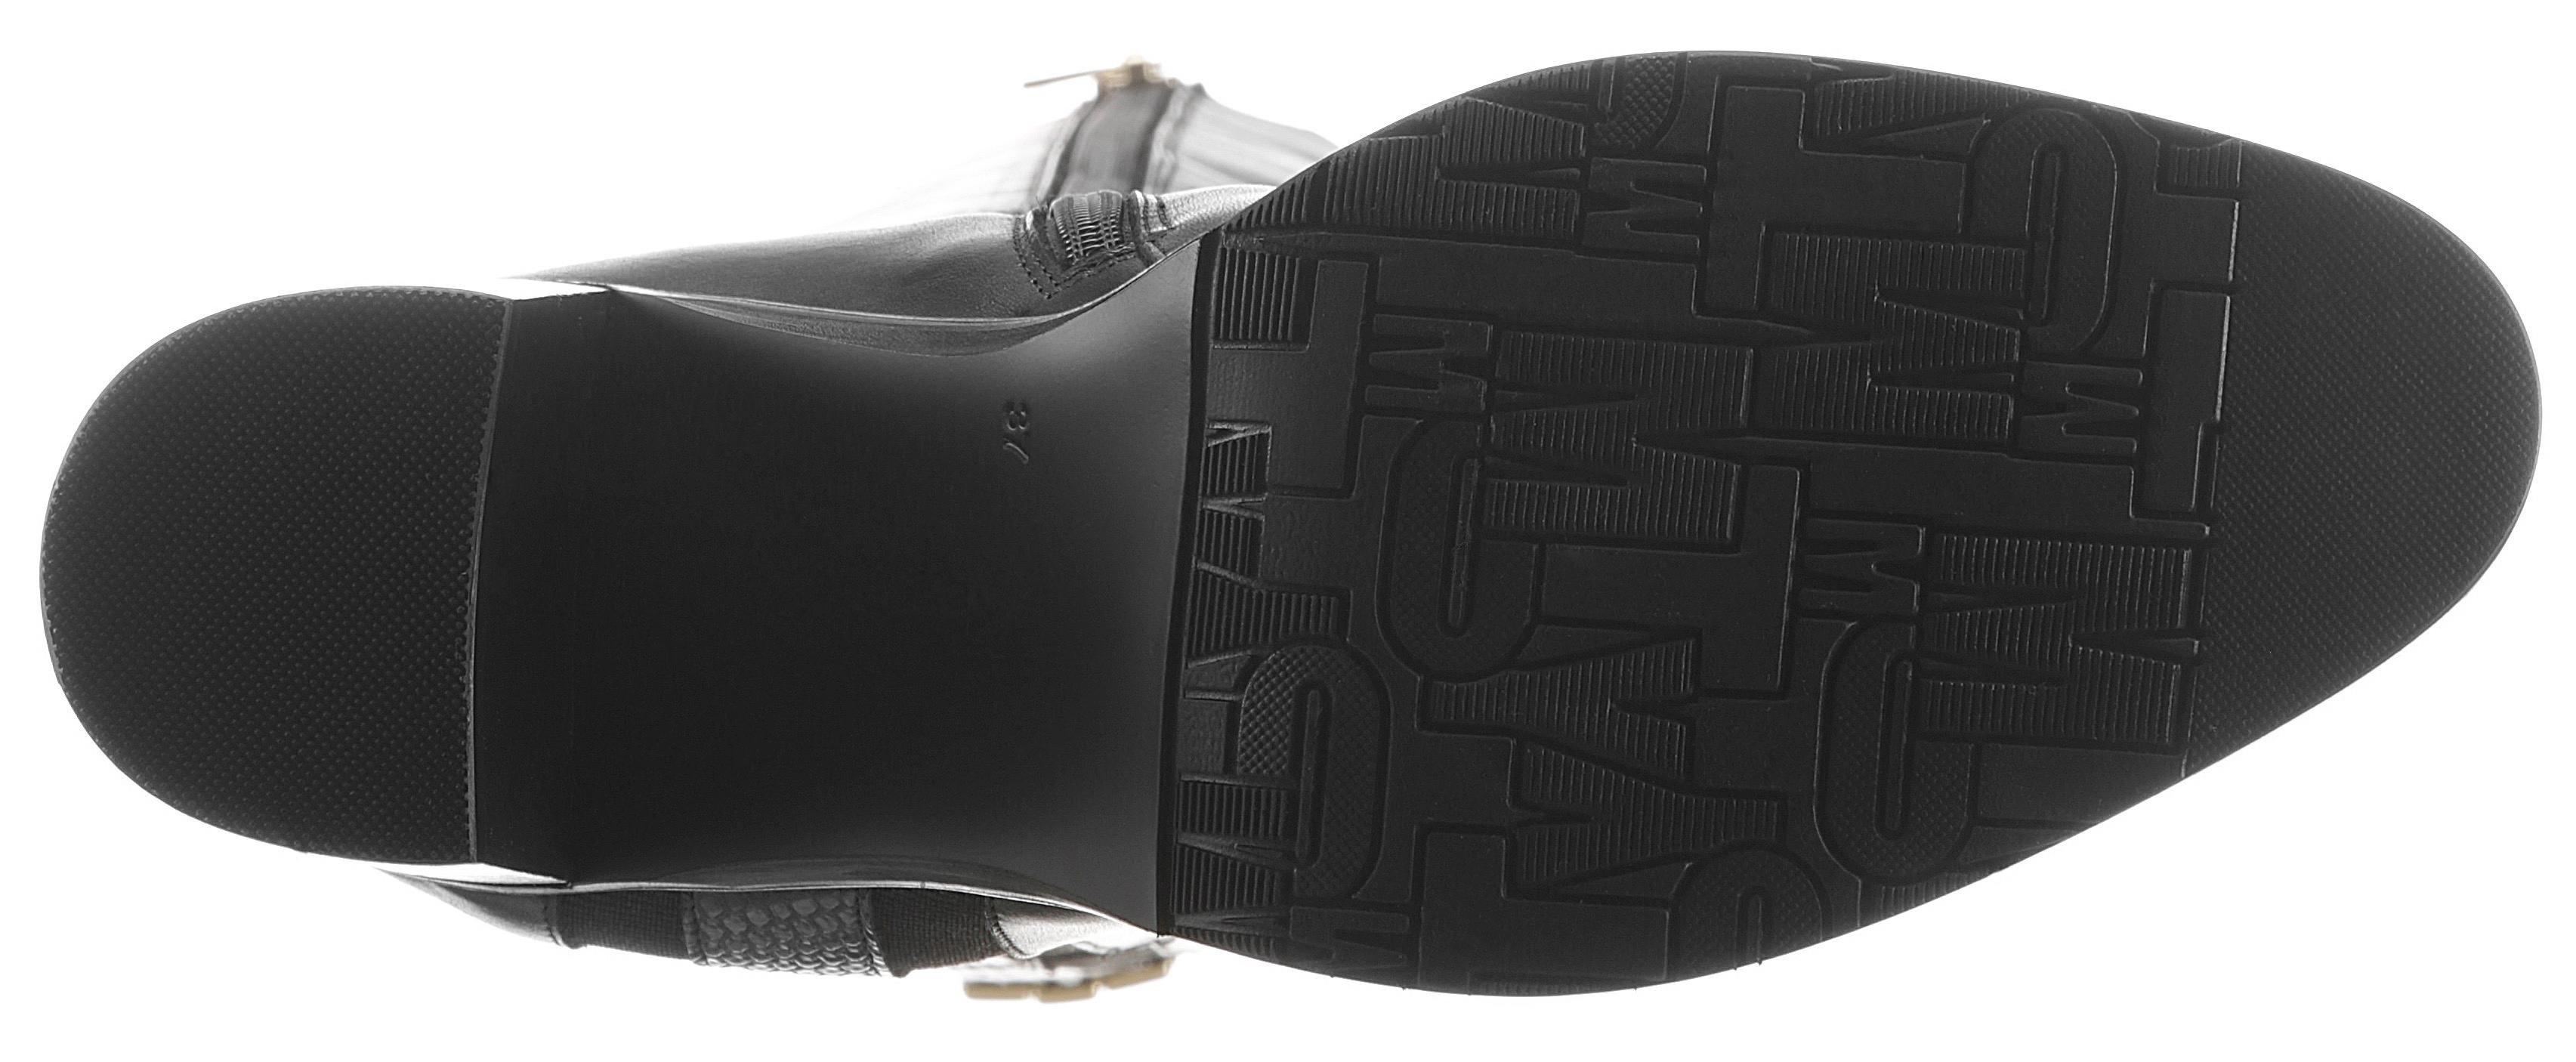 Tommy Hilfiger highheel-laarzen »TH INTERLOCK HIGH HEEL LONG BOOT« nu online bestellen